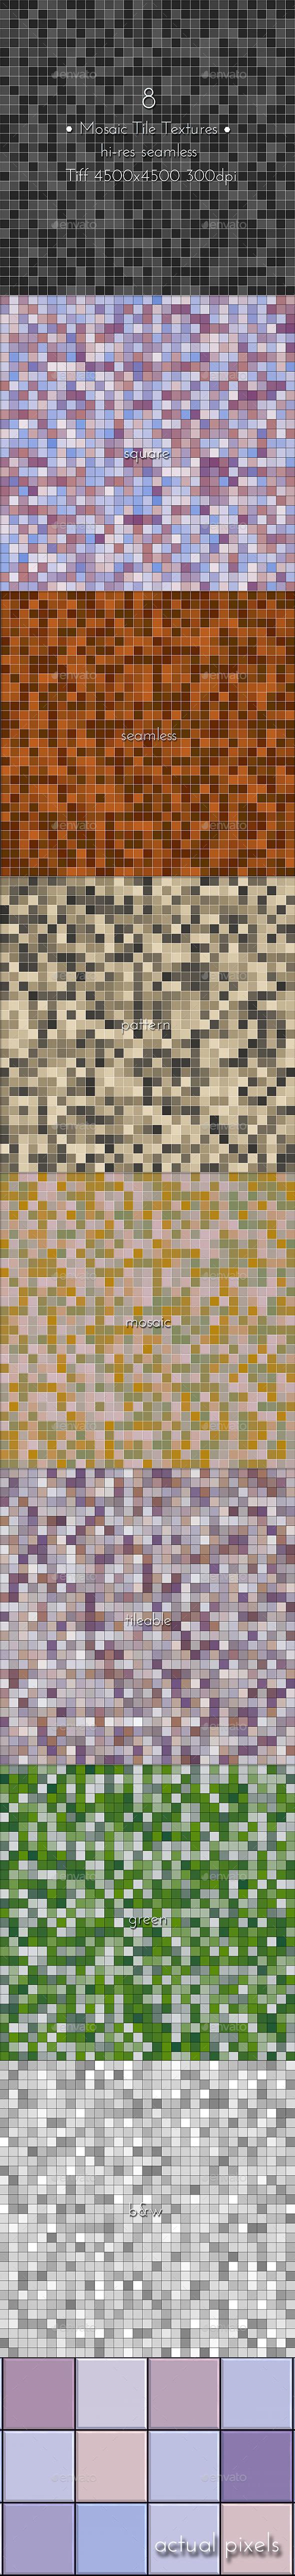 GraphicRiver Mosaic Tile Textures 9646917